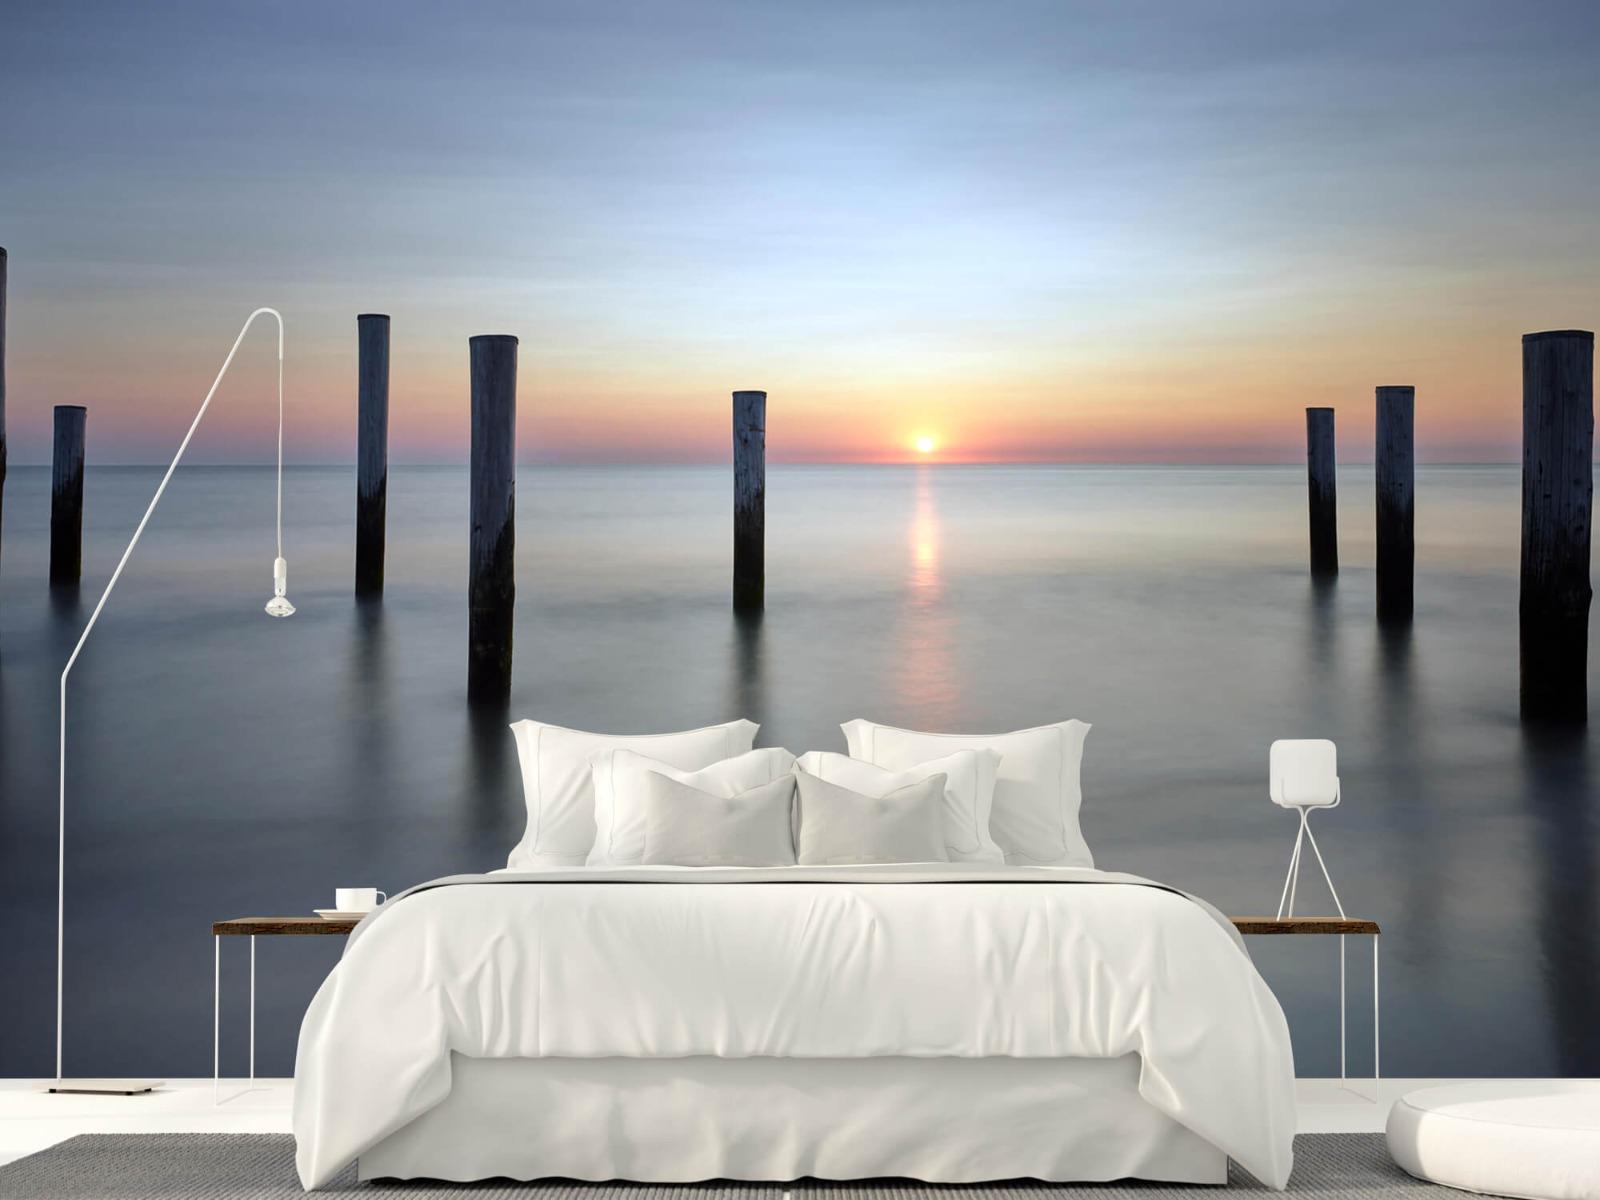 Zeeën en Oceanen - Strandpalen - Slaapkamer 1